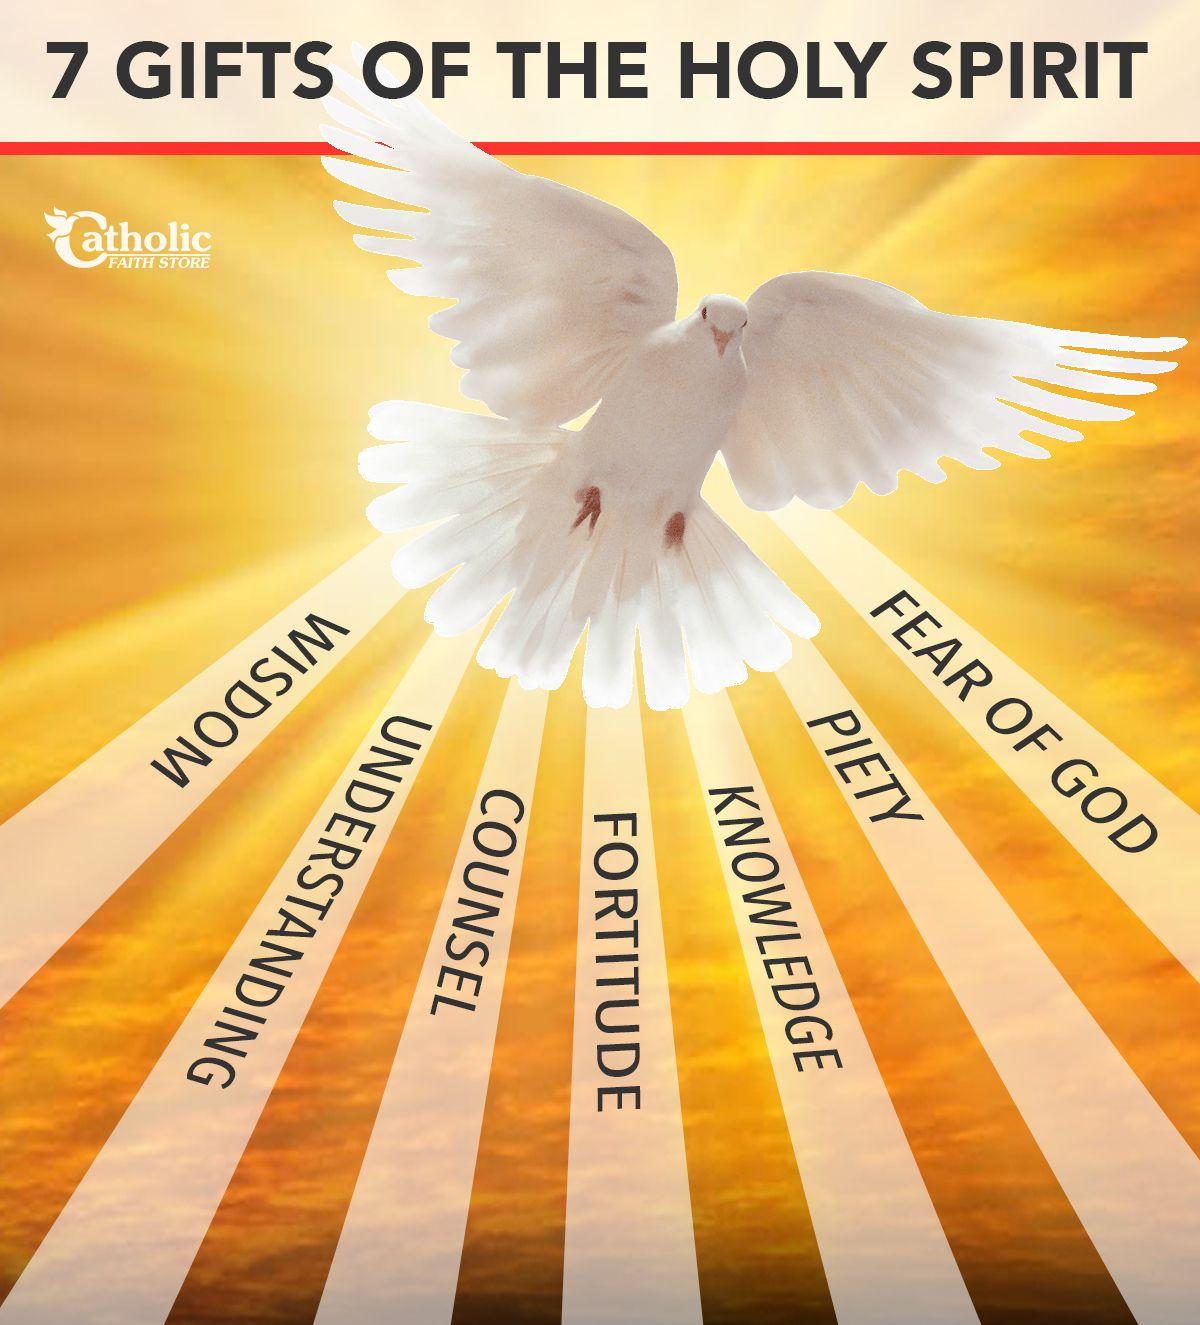 worksheet. Seven Gifts Of The Holy Spirit Worksheet. Carlos Lomas ...